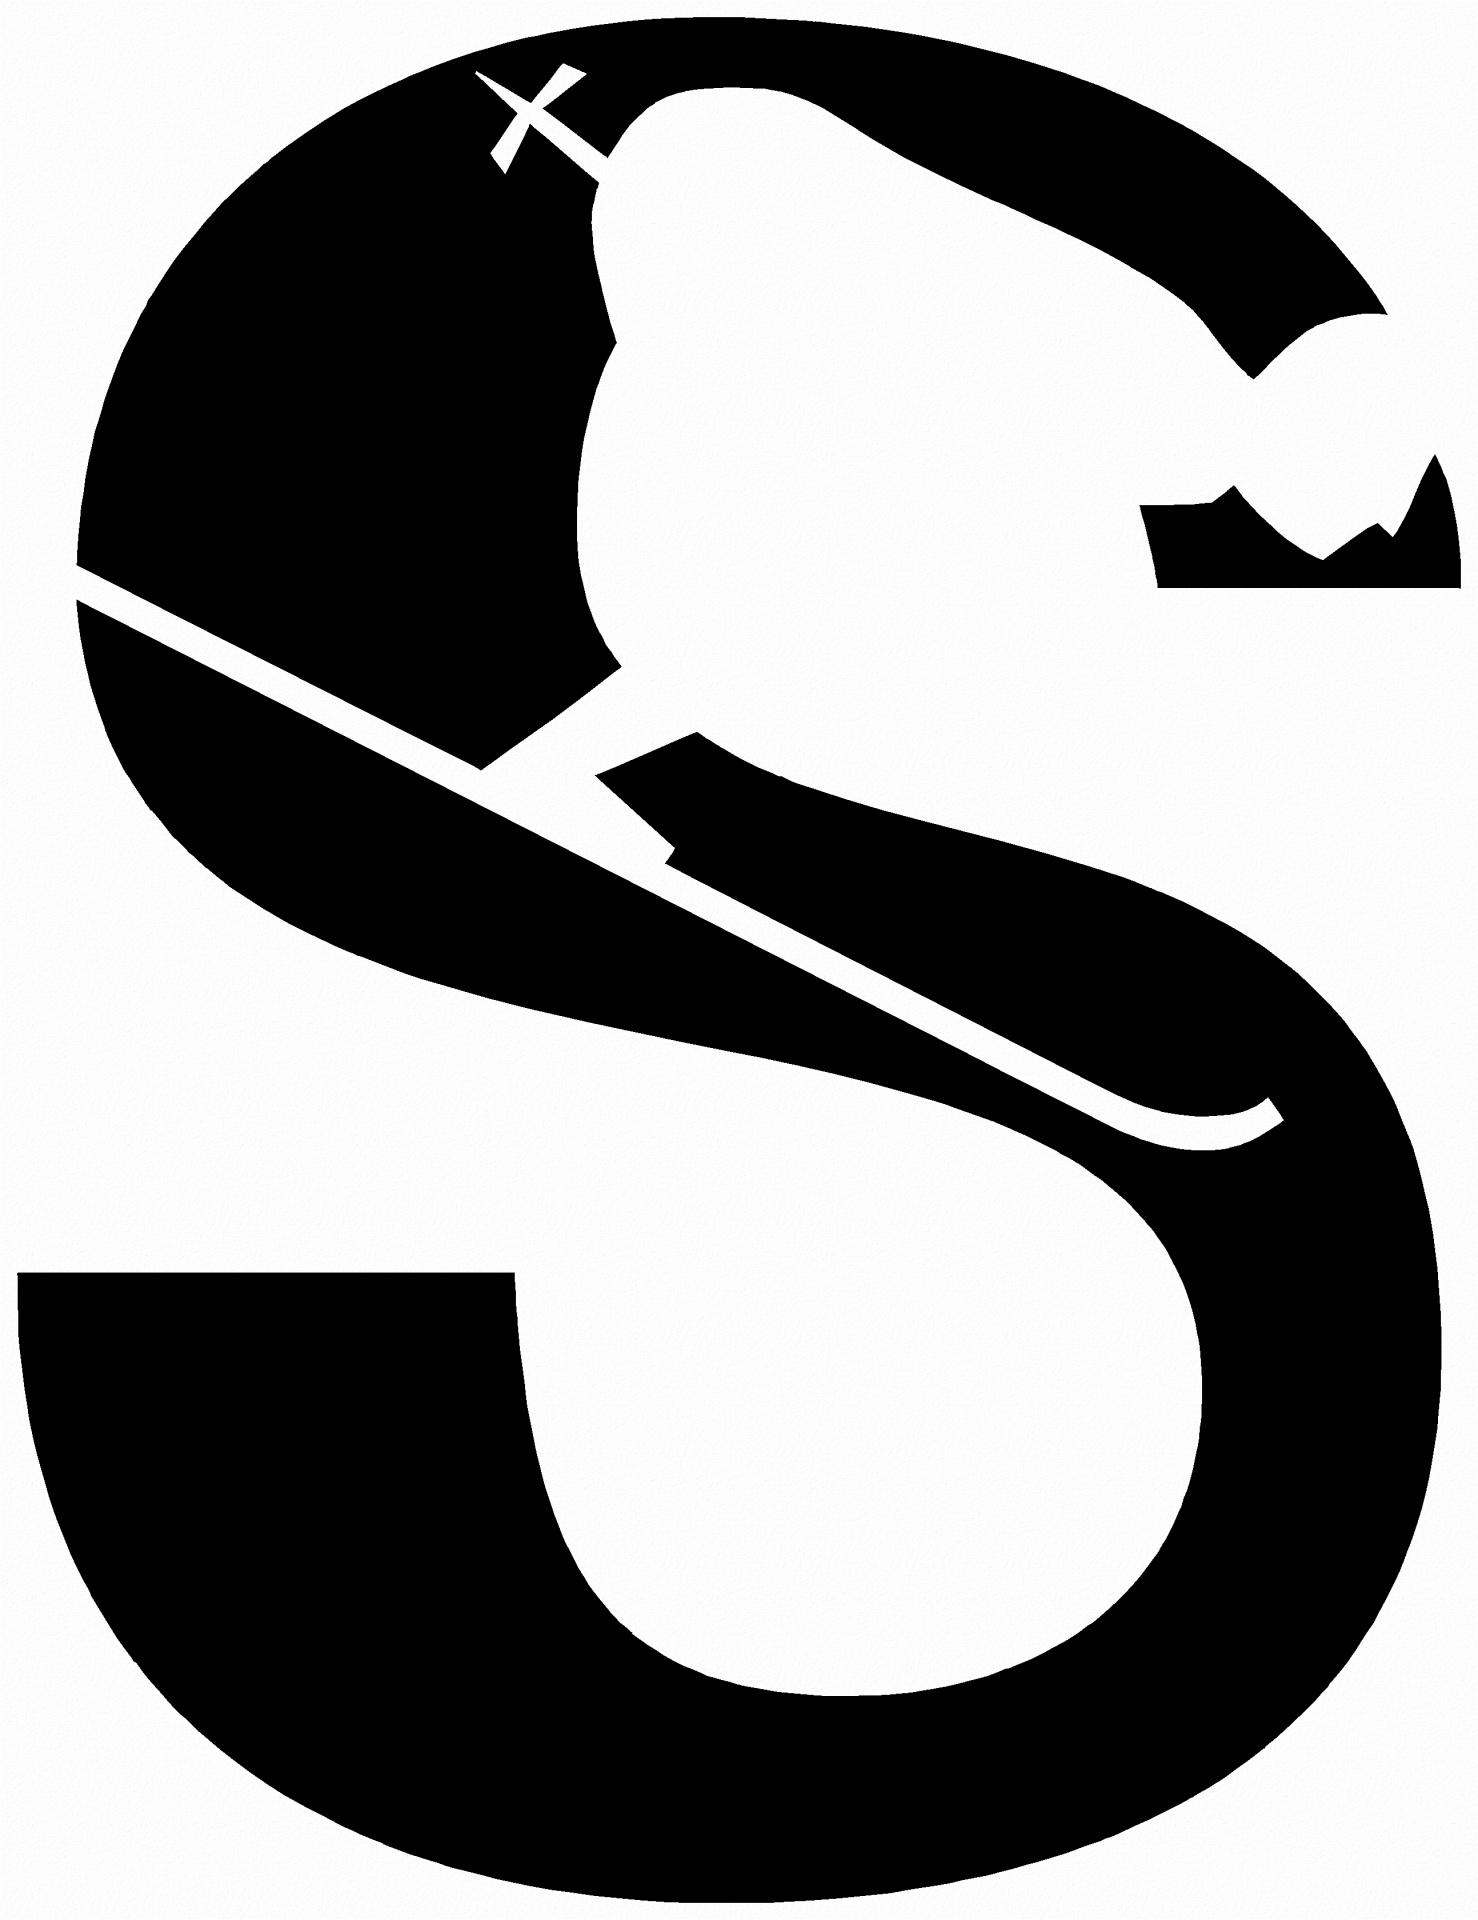 1478x1920 Alphabet Silhouette Letter S Free Stock Photo